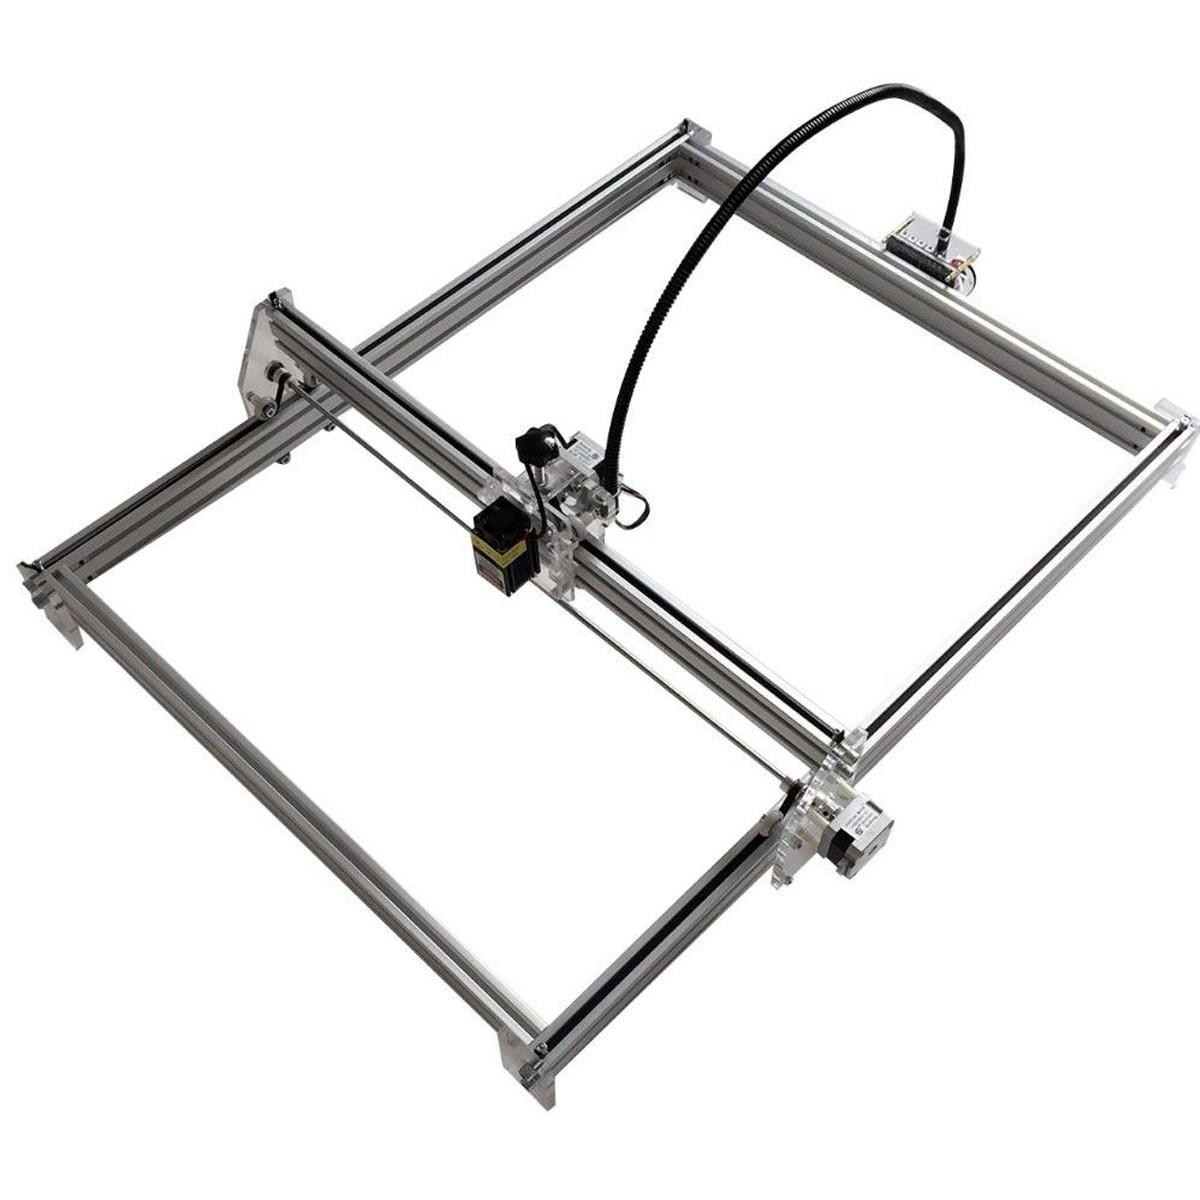 Only Us 899 90 Buy Best 15w 100x100cm Laser Engraving Machine Cnc Engraver Diy Marking Machine Printer Wood Desktop Cnc Laser Engraving Laser Engraving Machine